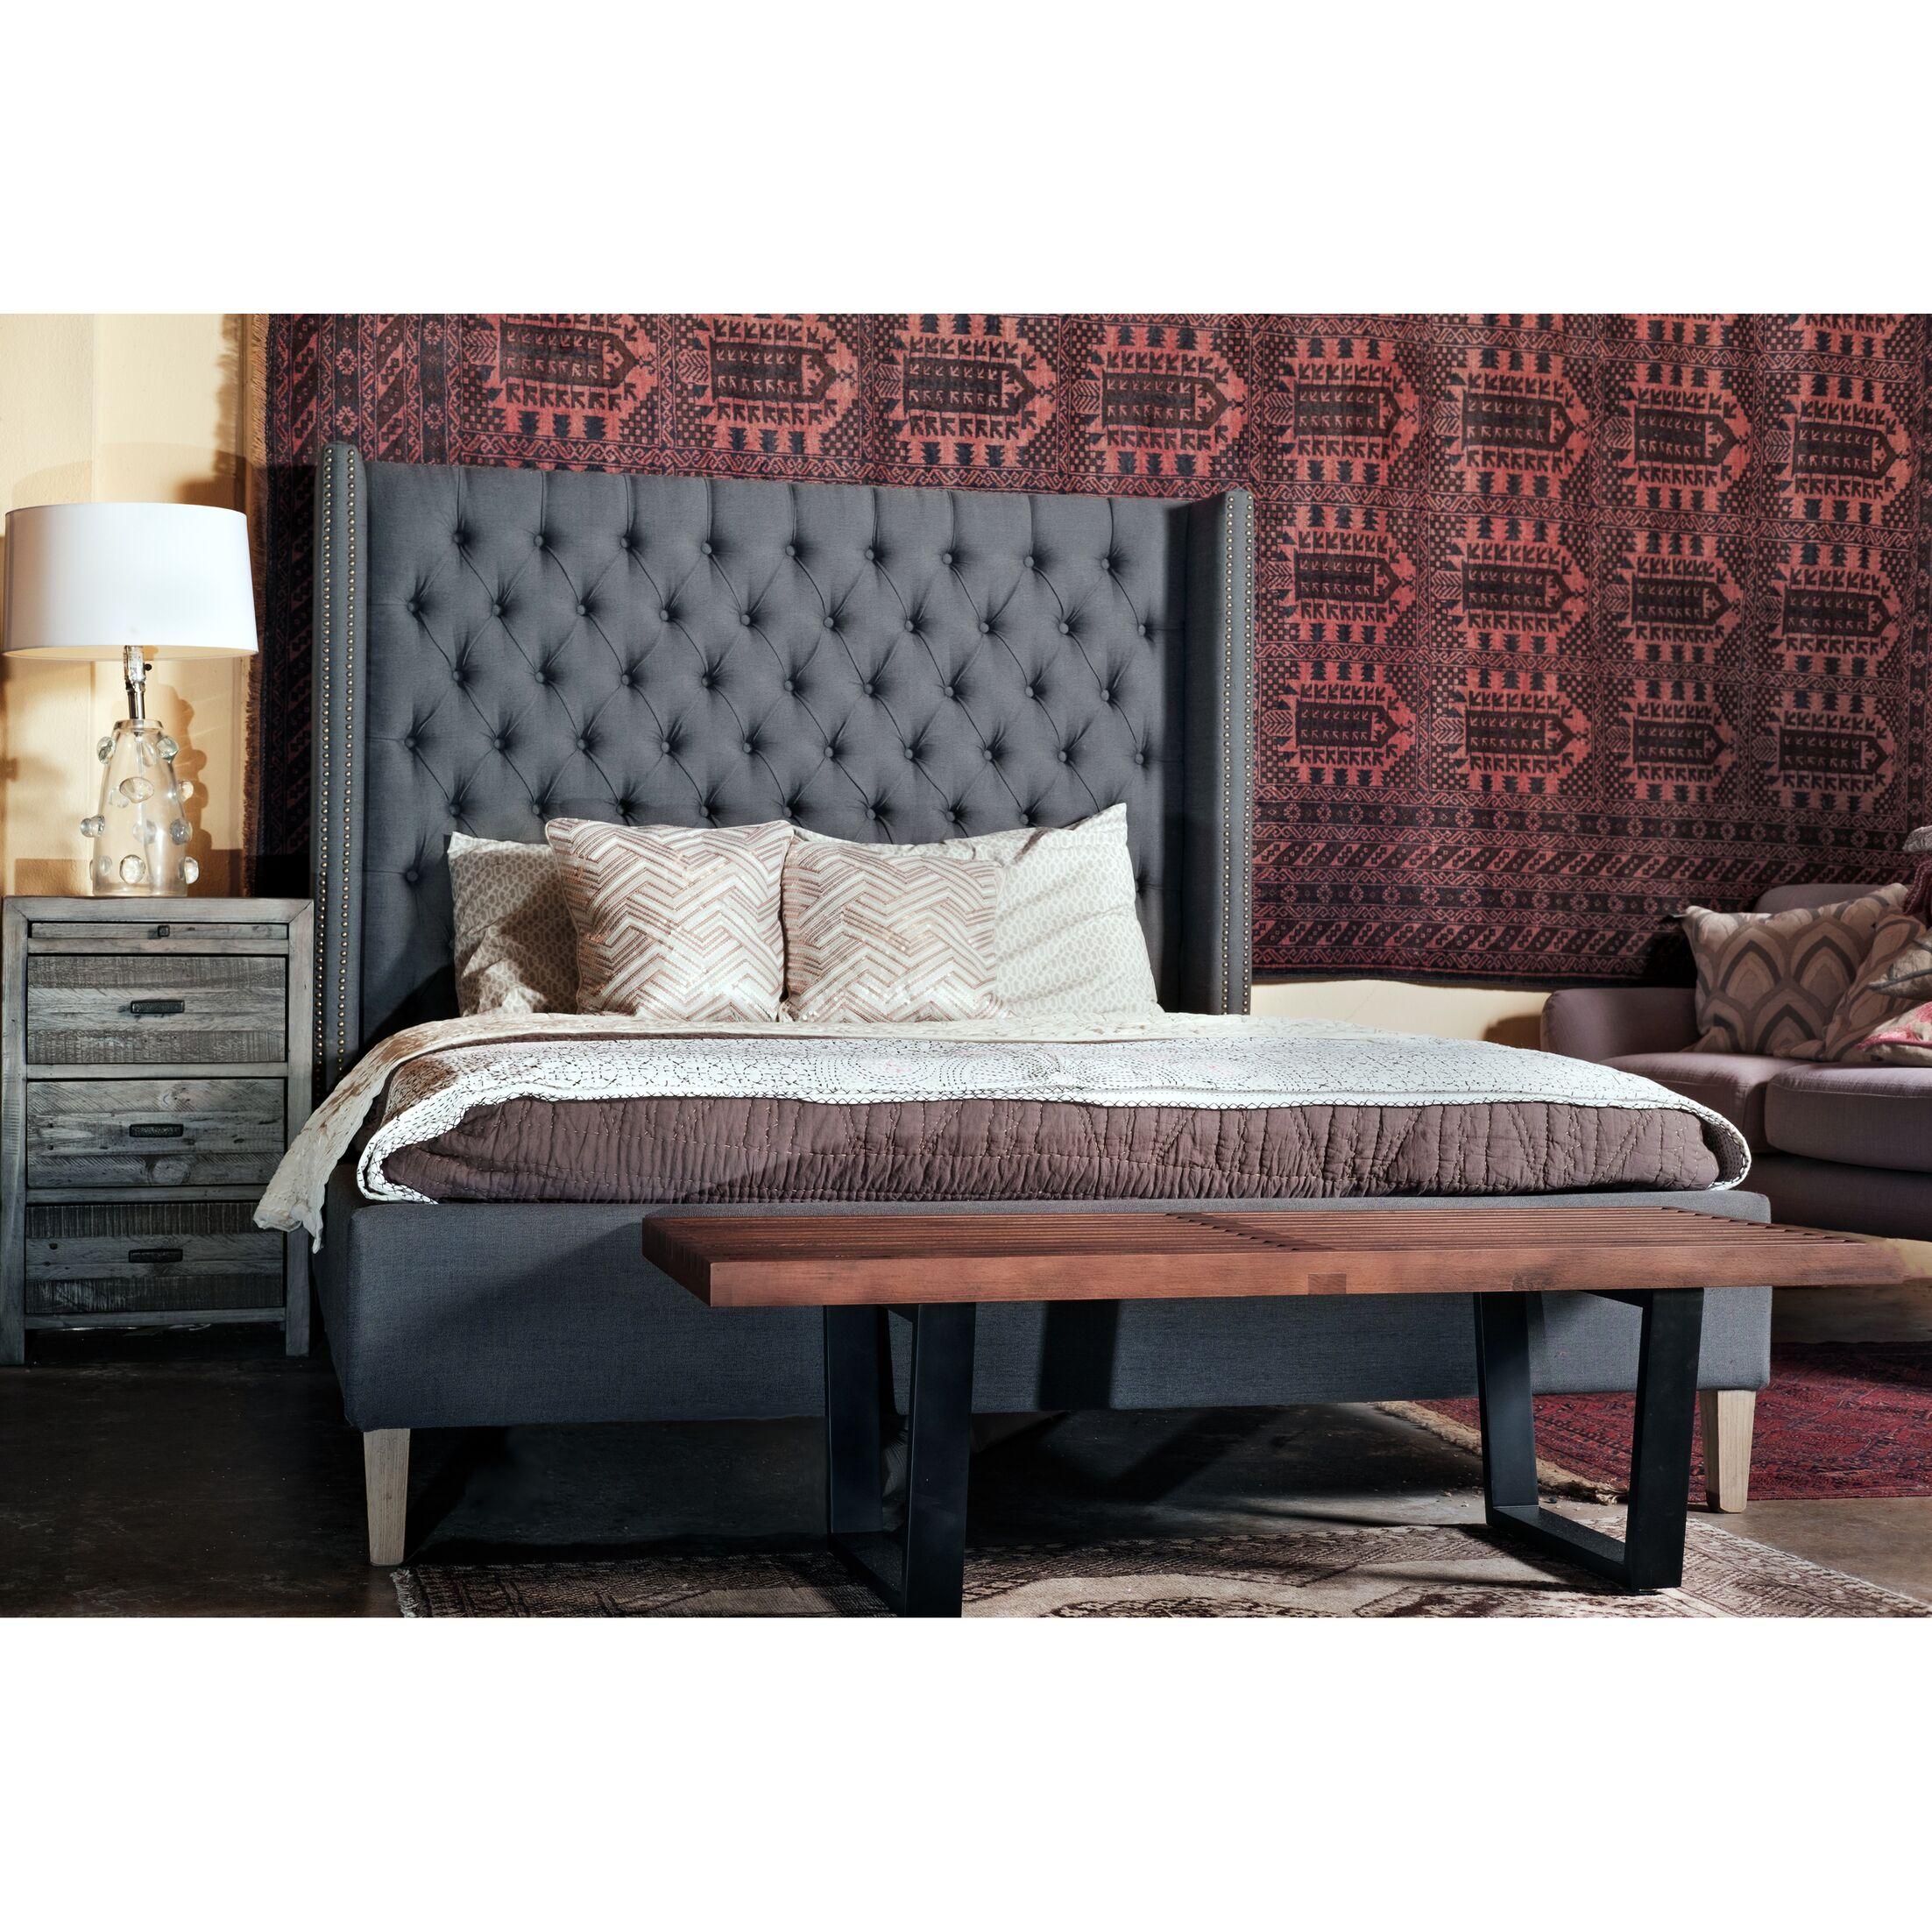 Webb Queen Upholstered Sleigh Bed